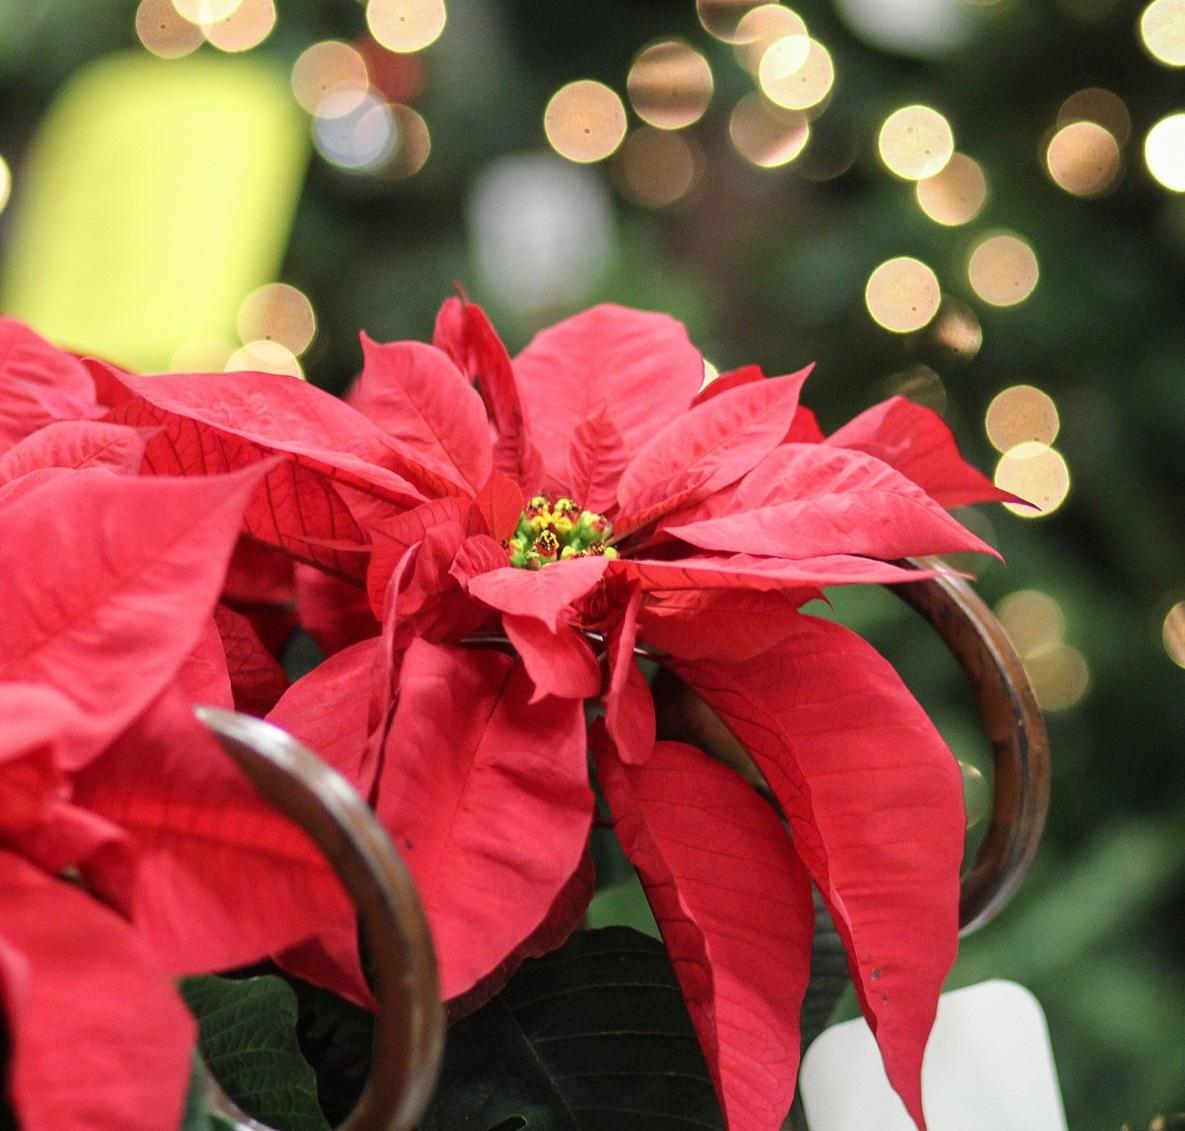 Étoile de Noël - Poinsettia